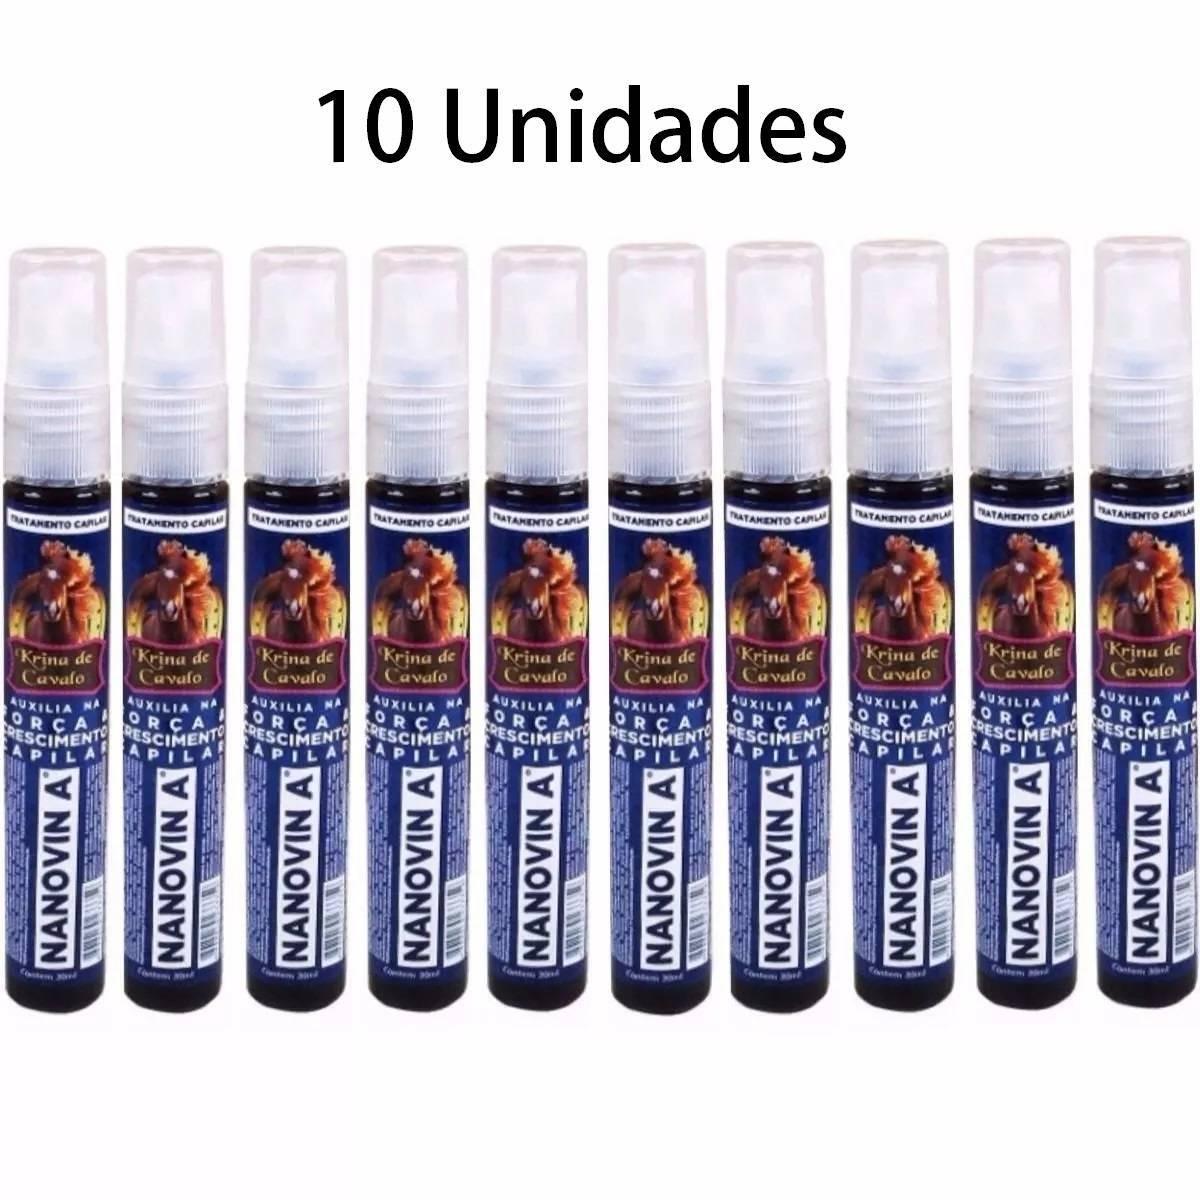 Nanovin A Krina de Cavalo Tonico Crescimento Capilar Kit c/